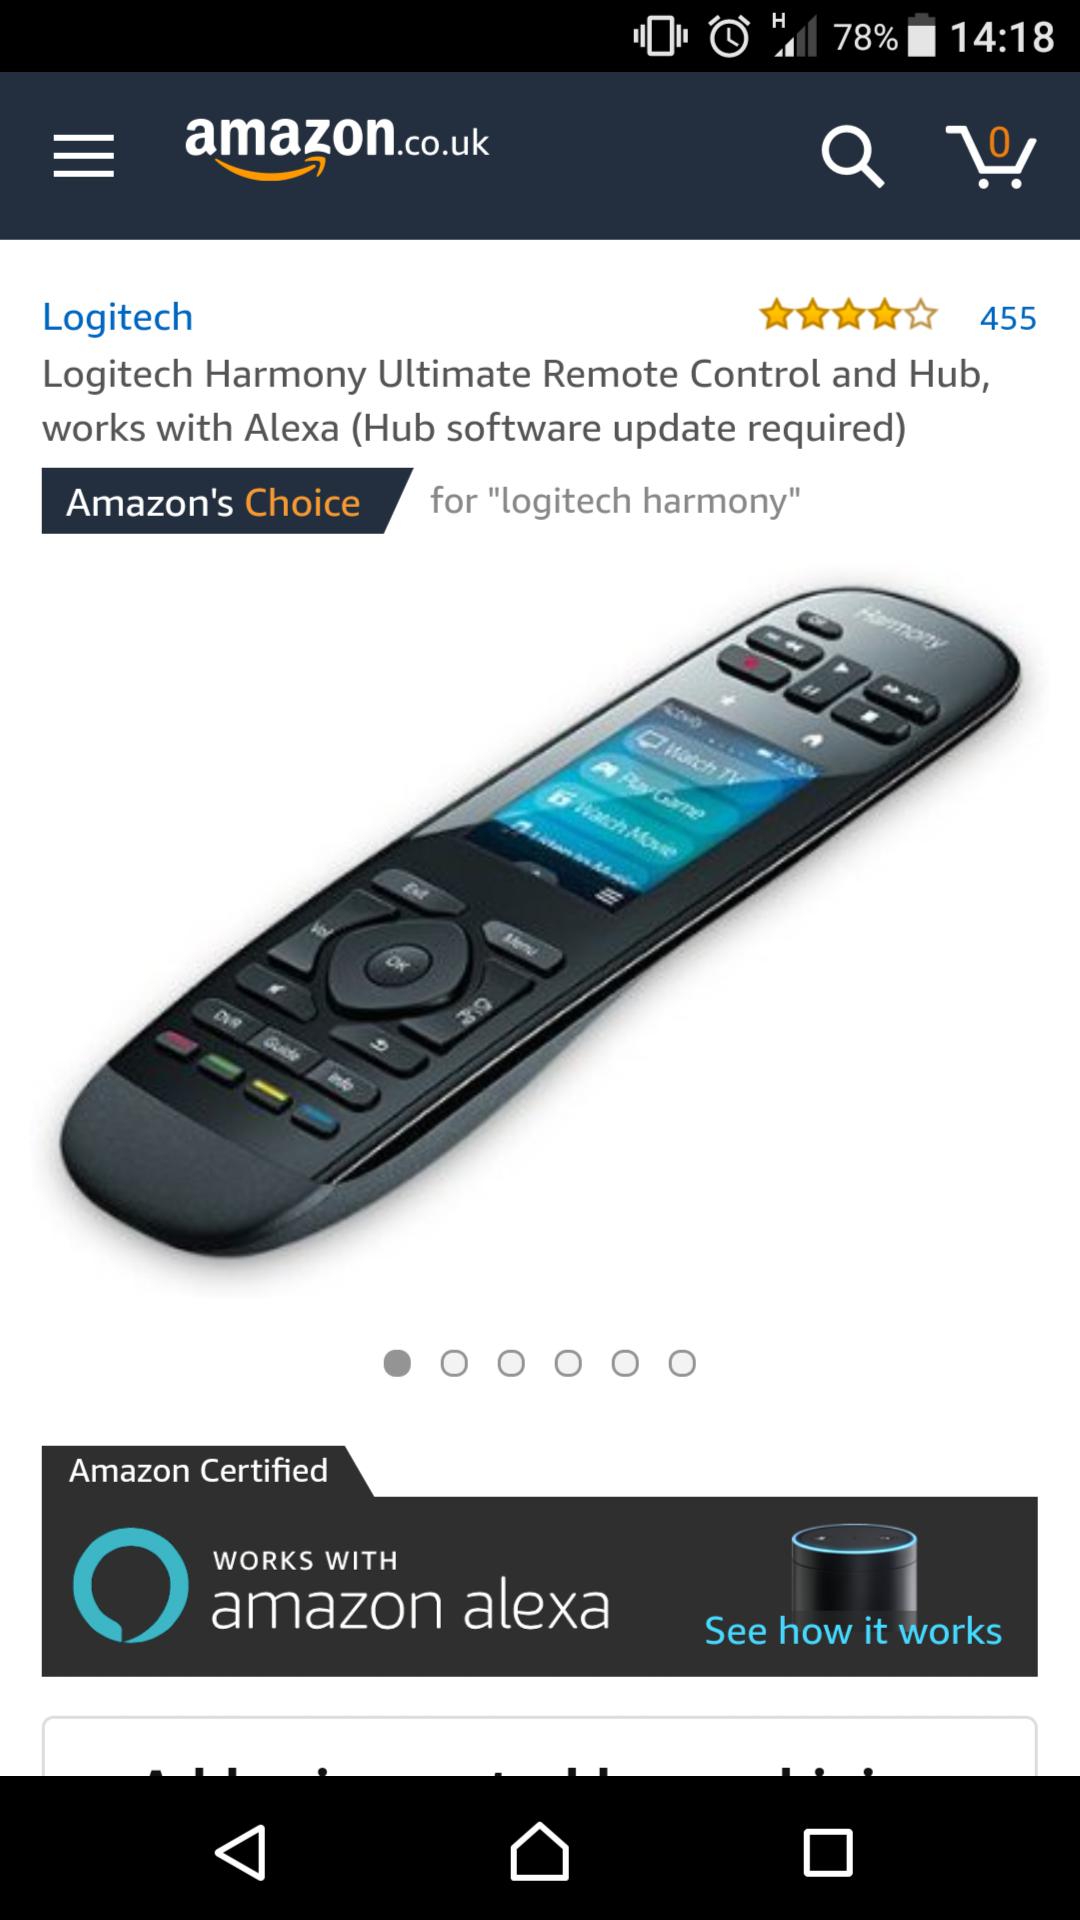 Logitech Harmony Ultimate Remote Control and Hub - £99 @ Amazon